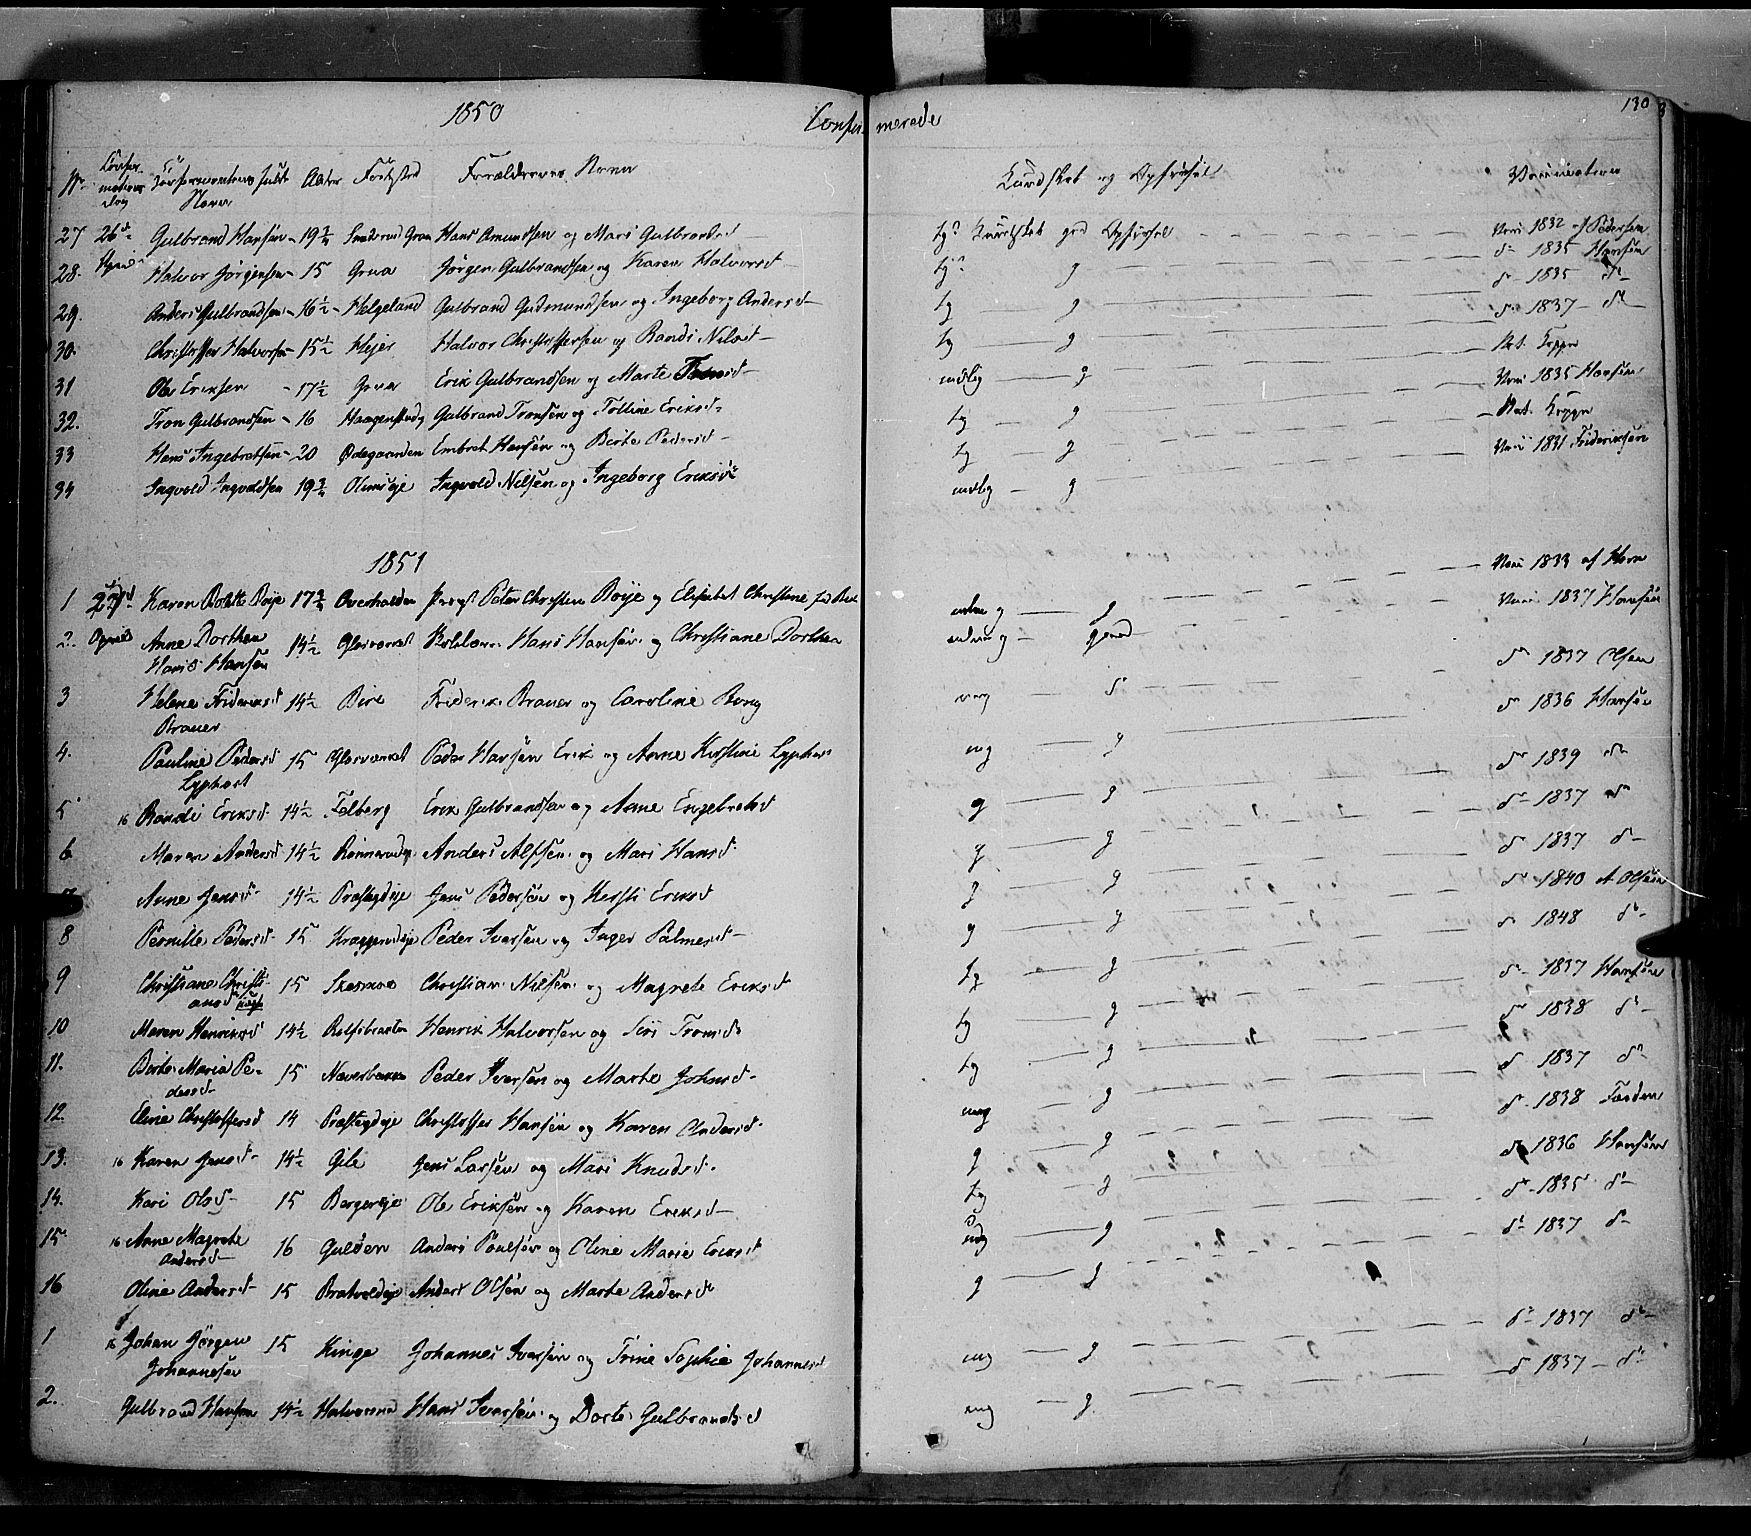 SAH, Jevnaker prestekontor, Ministerialbok nr. 6, 1837-1857, s. 130